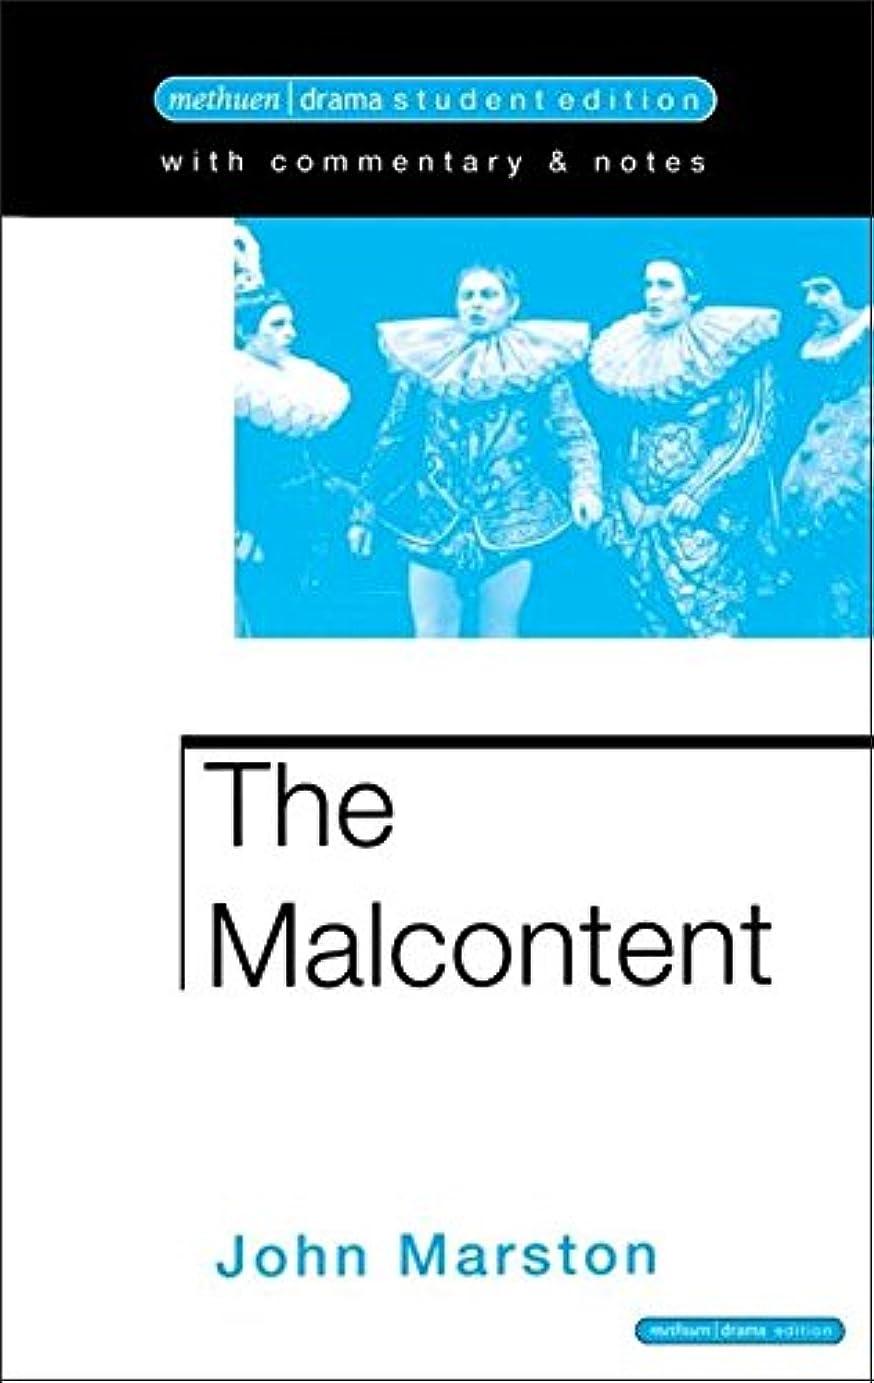 神秘現実反逆Malcontent (Methuen Paperback)